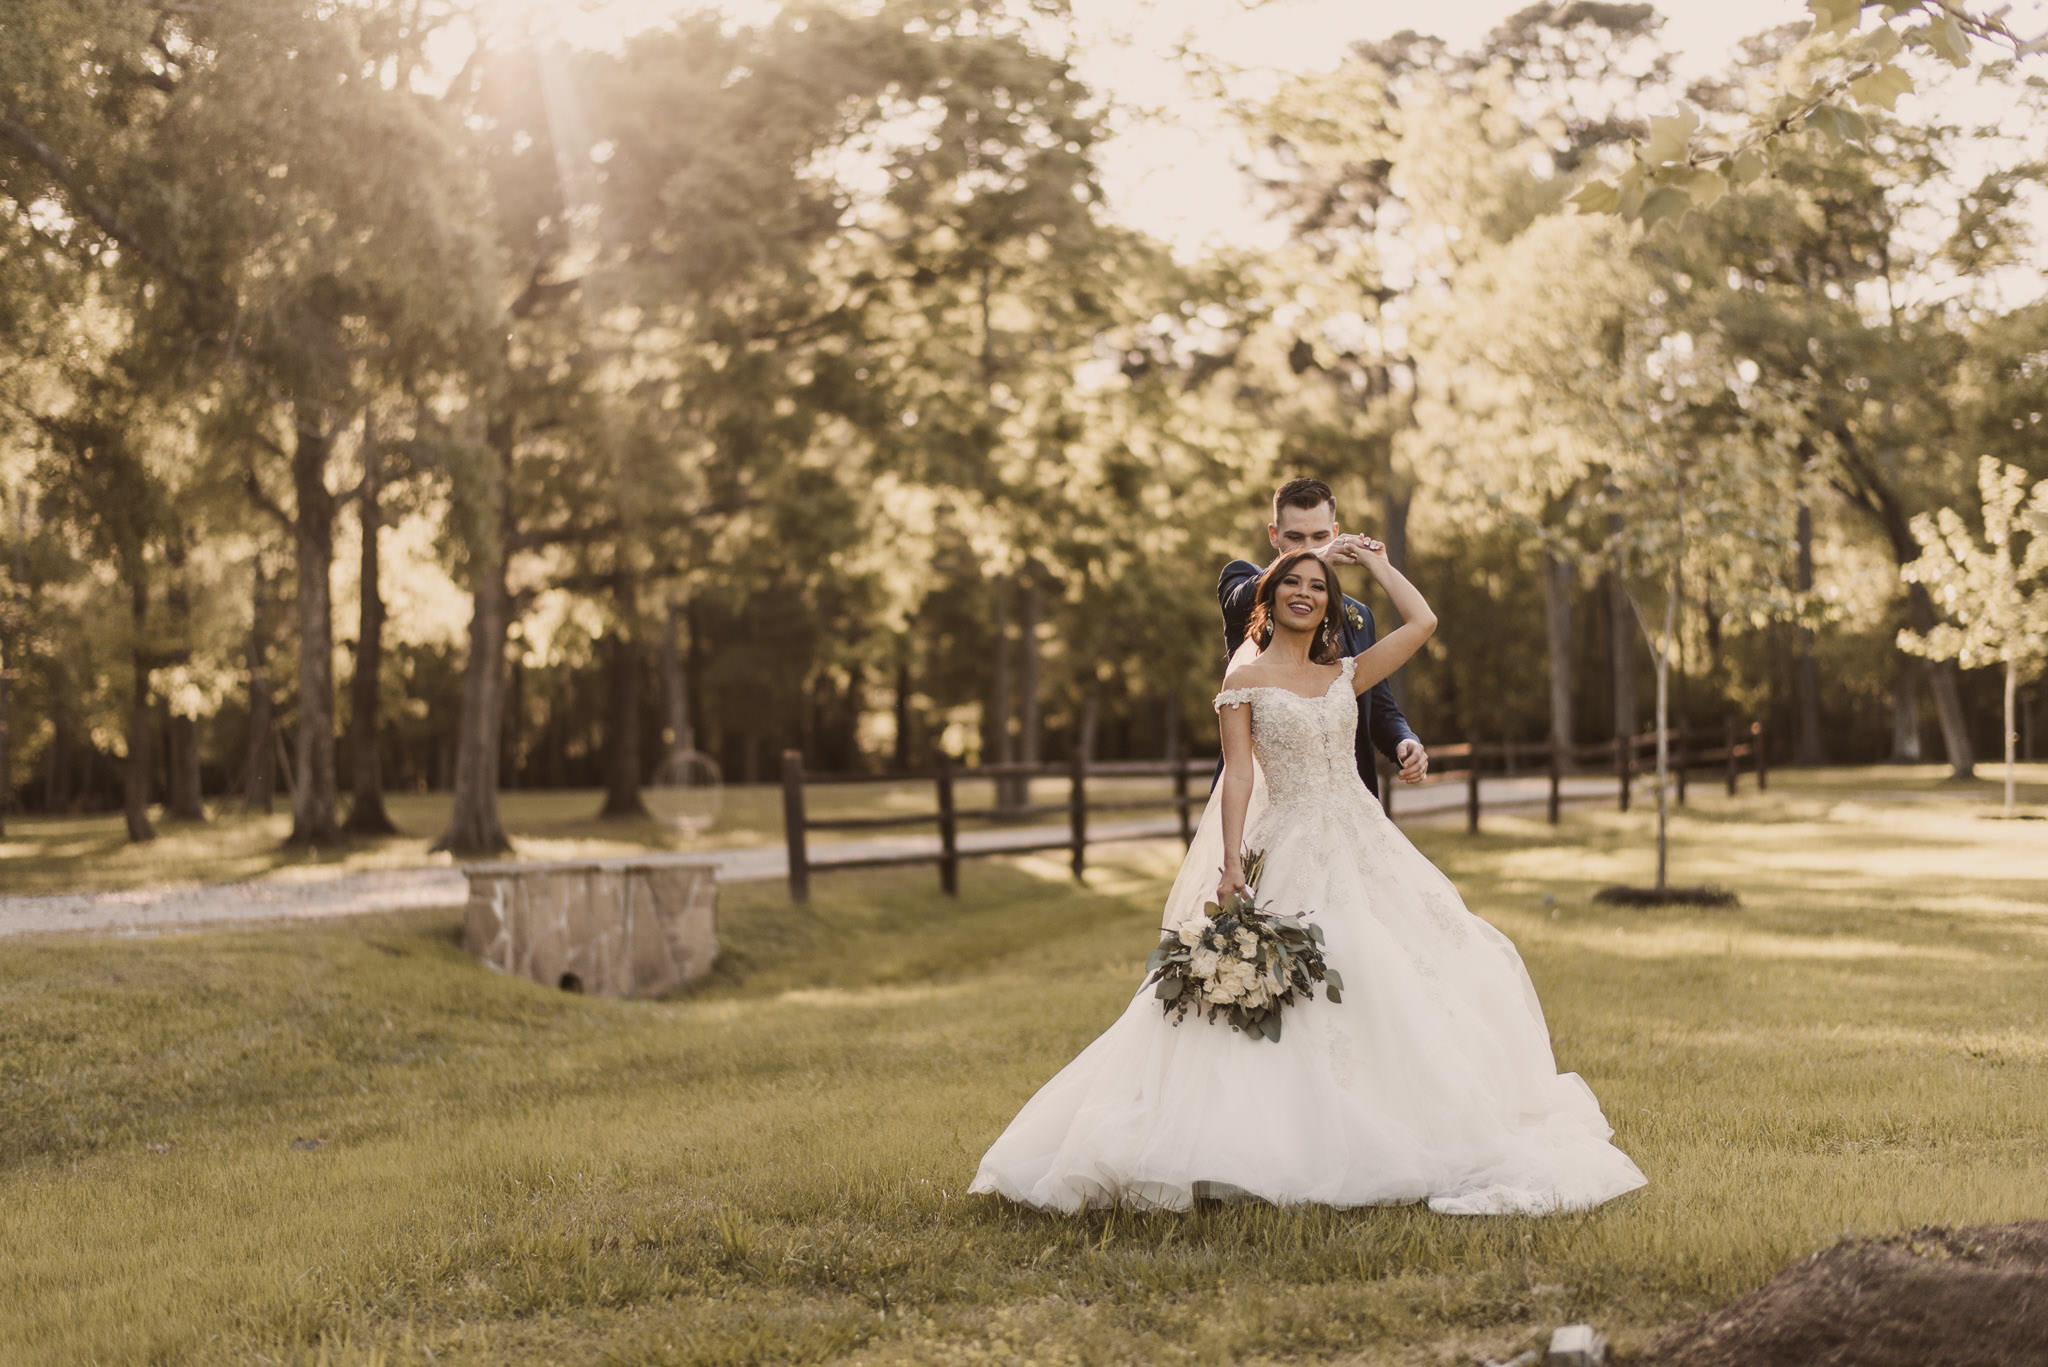 adriana-christian-wedding-re-sm-115.jpg